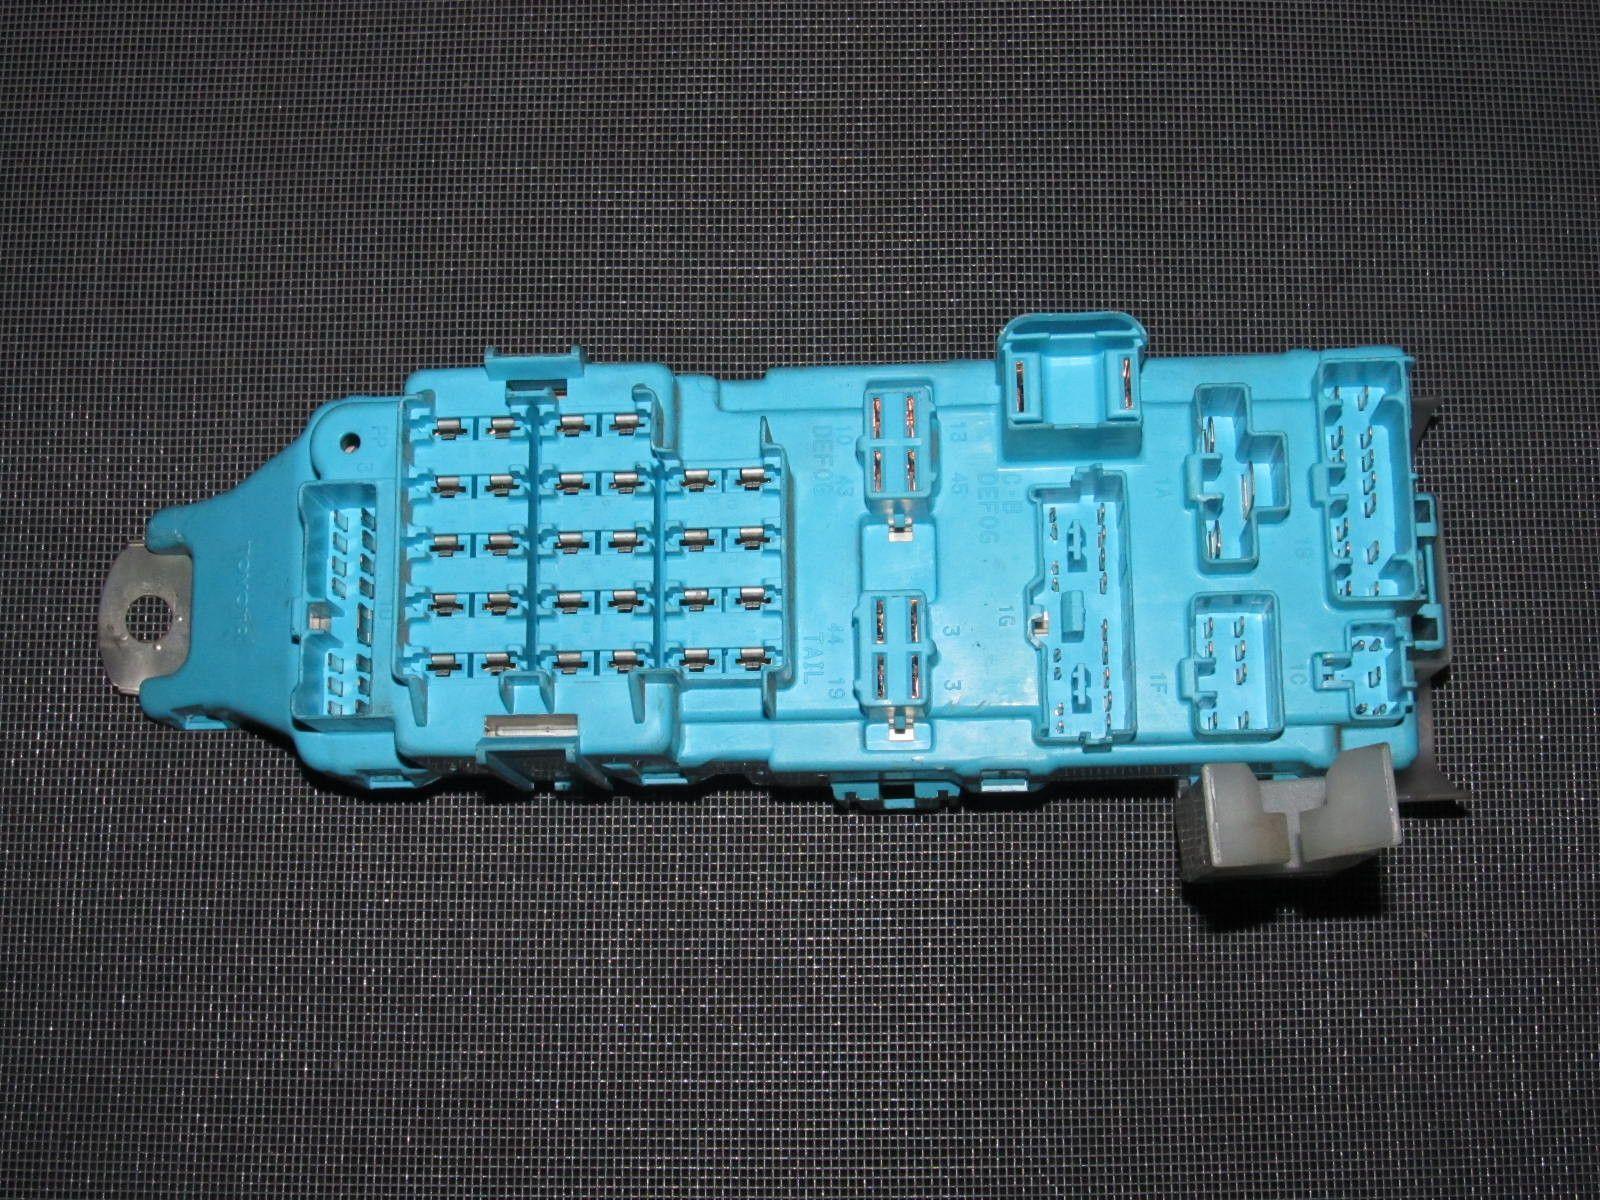 medium resolution of 86 92 toyota supra oem interior fuse box autopartone com products